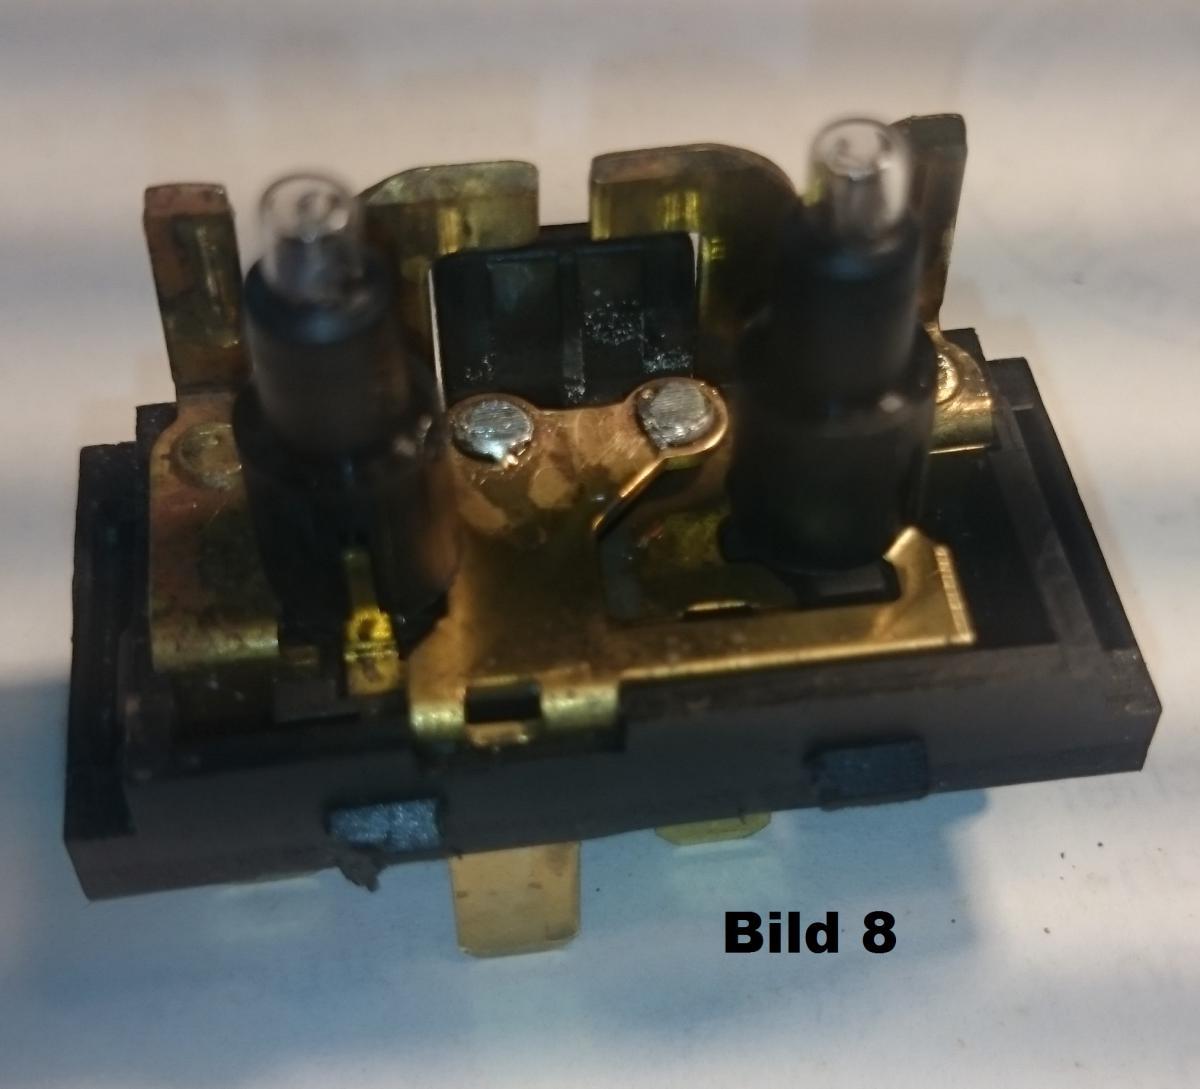 schalter elektrische fensterheber reparieren elektrik instrumente beleuchtung wikipedia. Black Bedroom Furniture Sets. Home Design Ideas